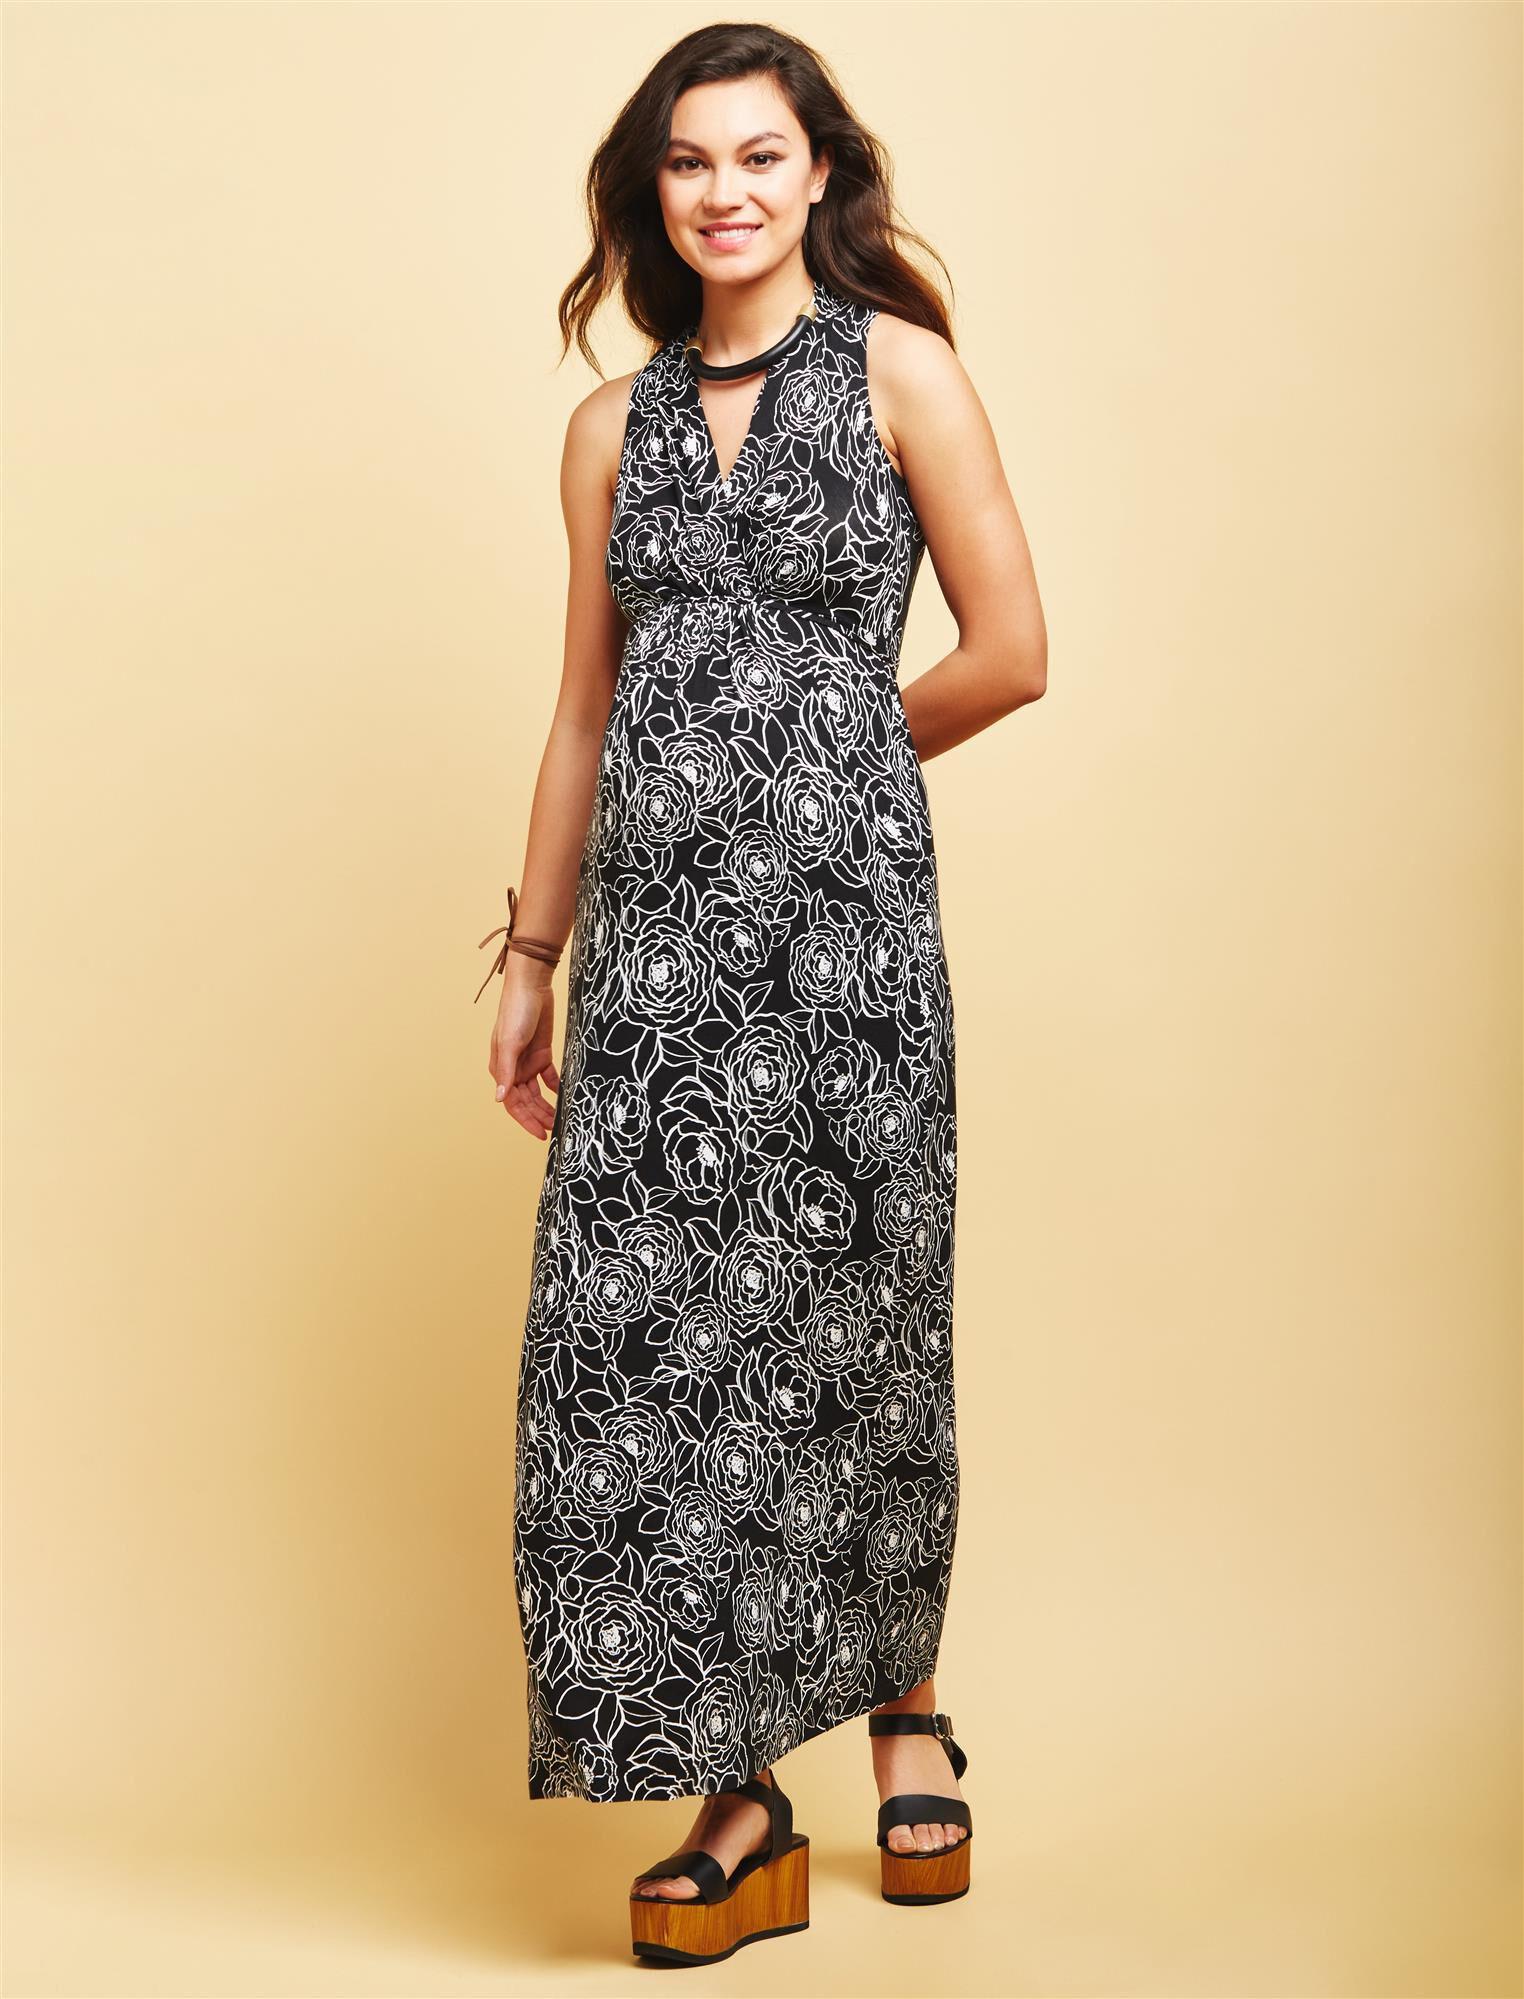 Maxi dress for pregnancy